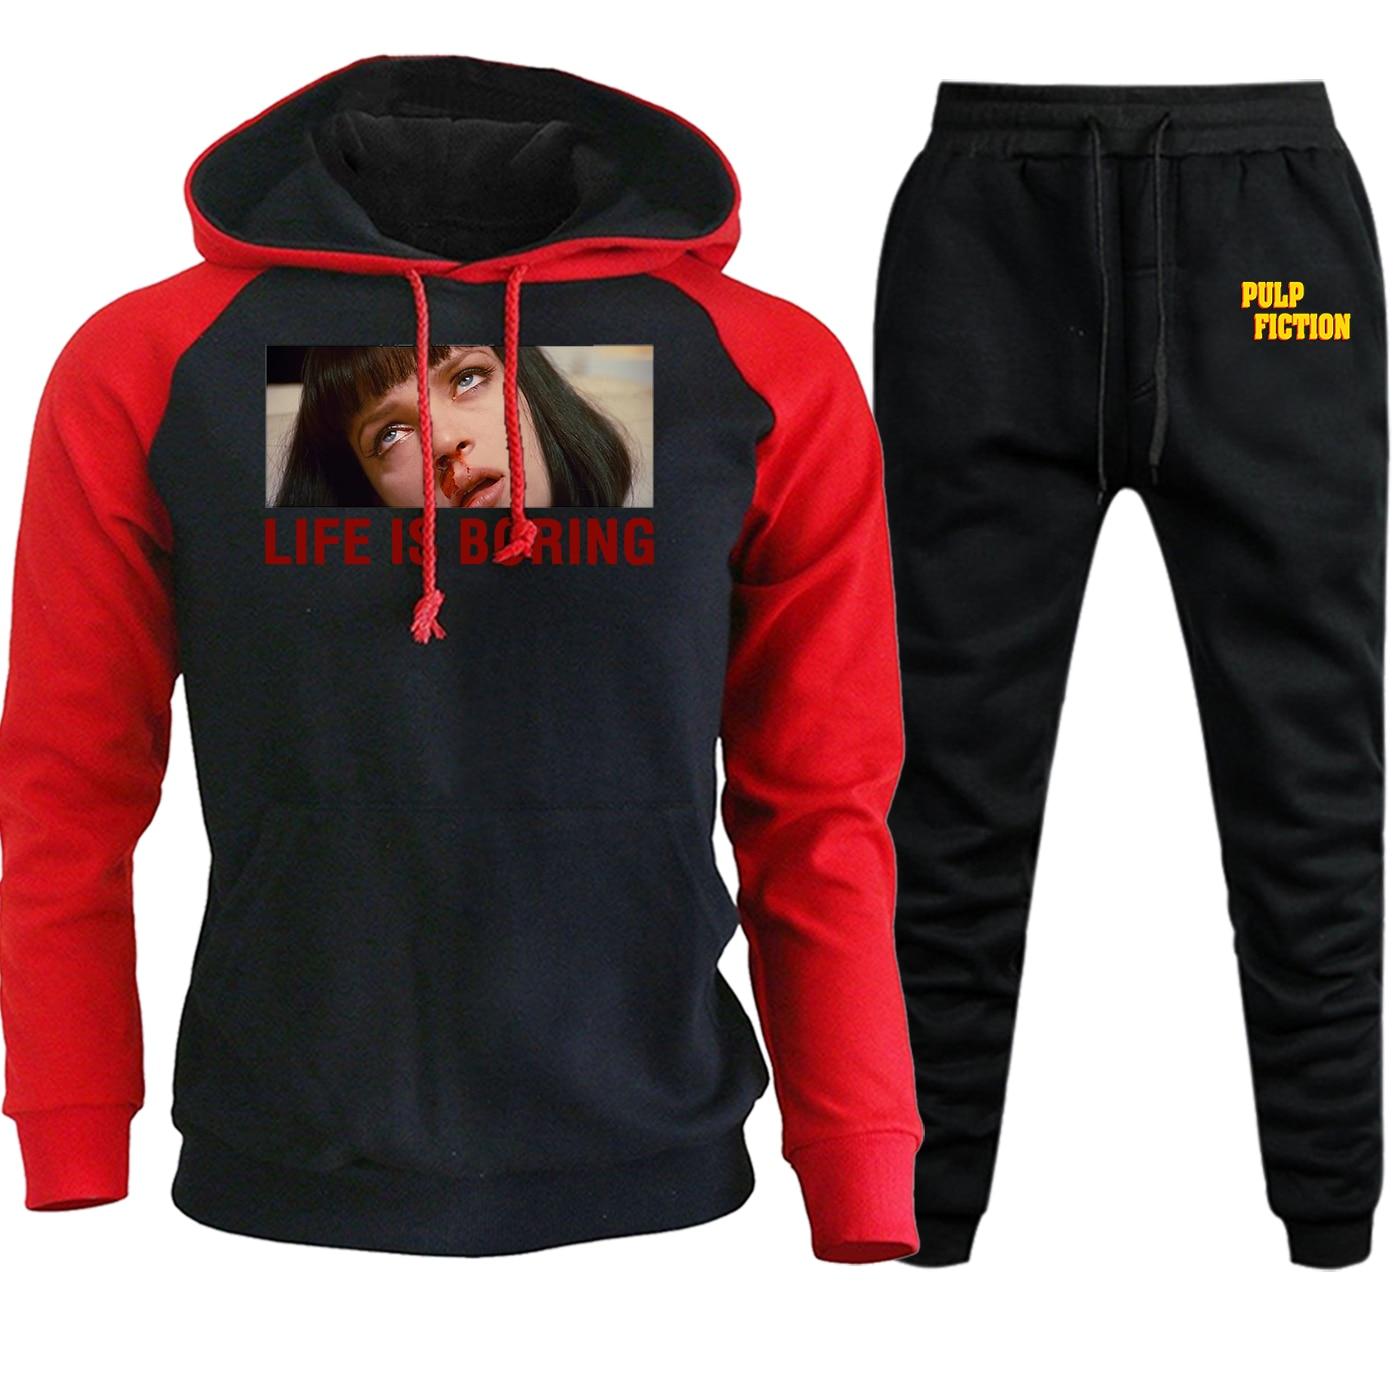 Pulp Fiction Life Is Boring 2019 New Autumn Winter Men Hoodies Streetwear Raglan Vintage Suit Casual Pullover+Pants 2 Piece Set